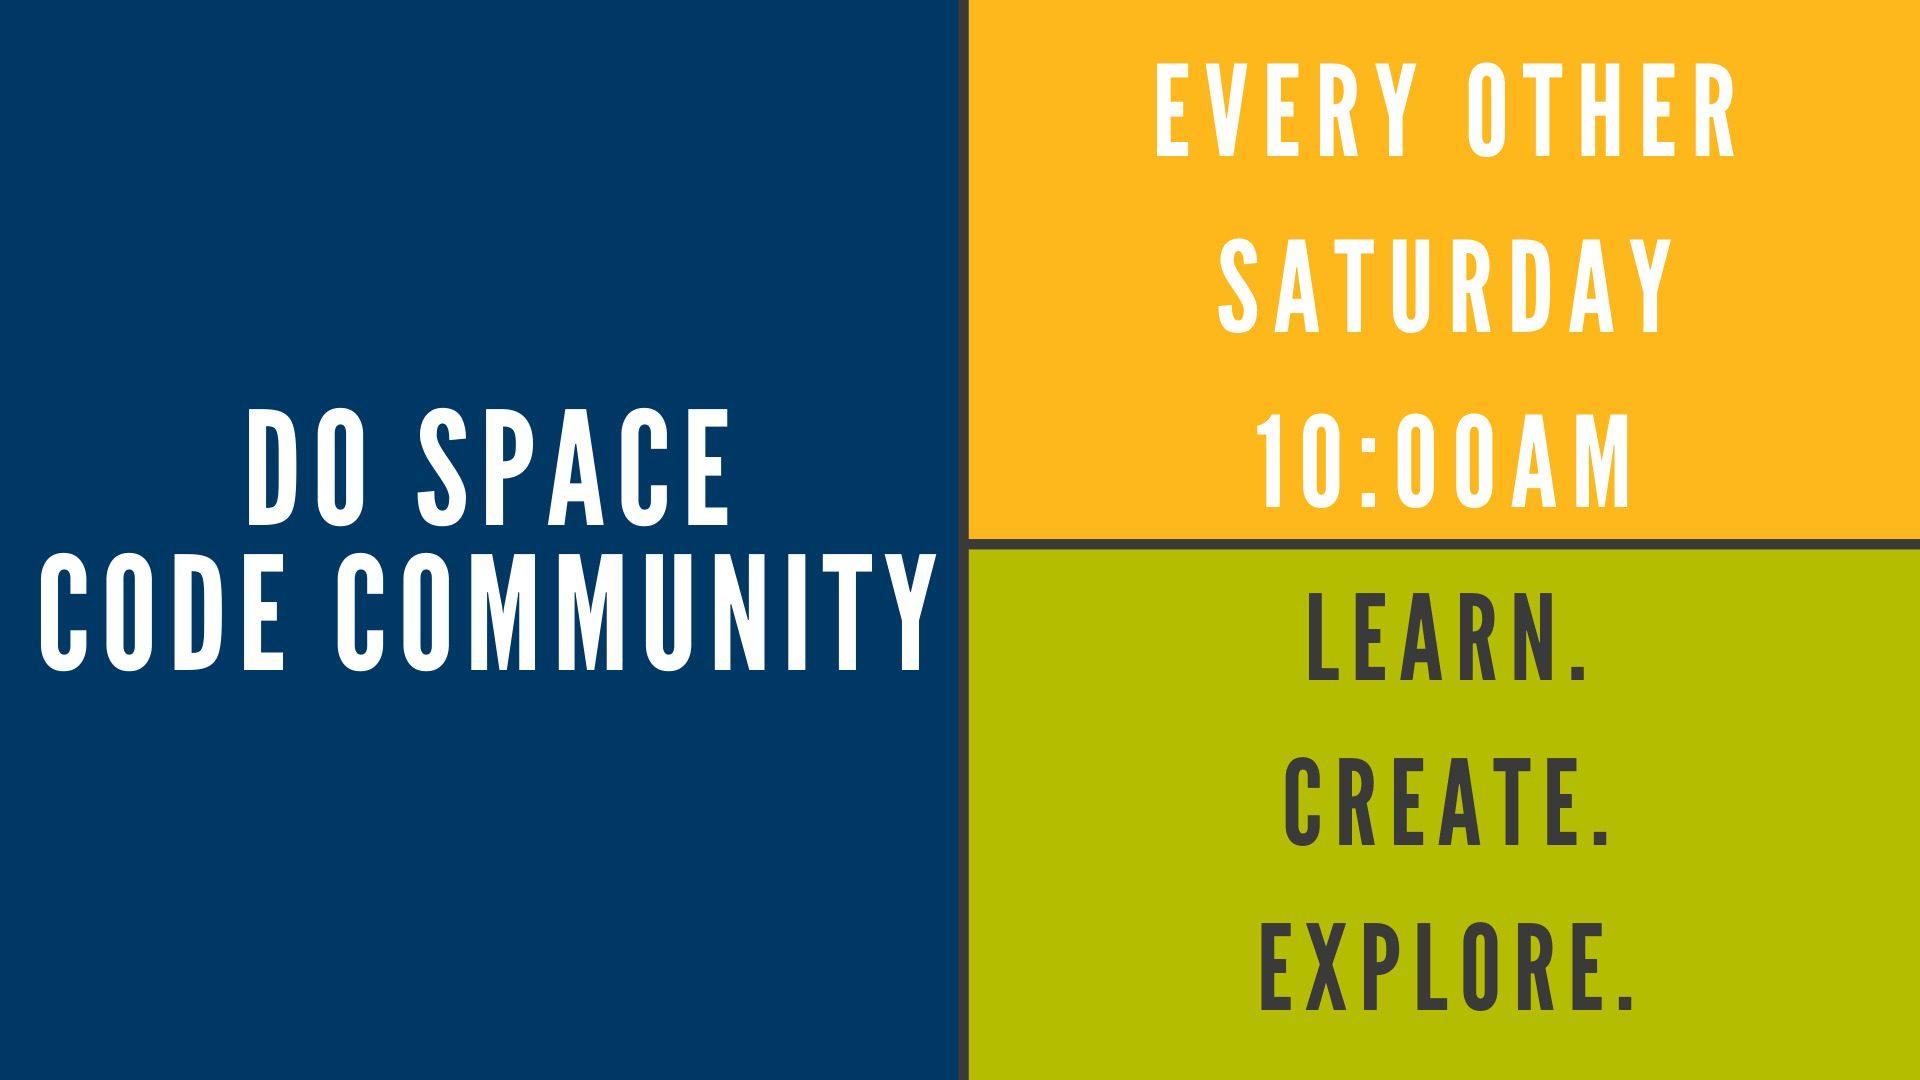 Do Space Code Community